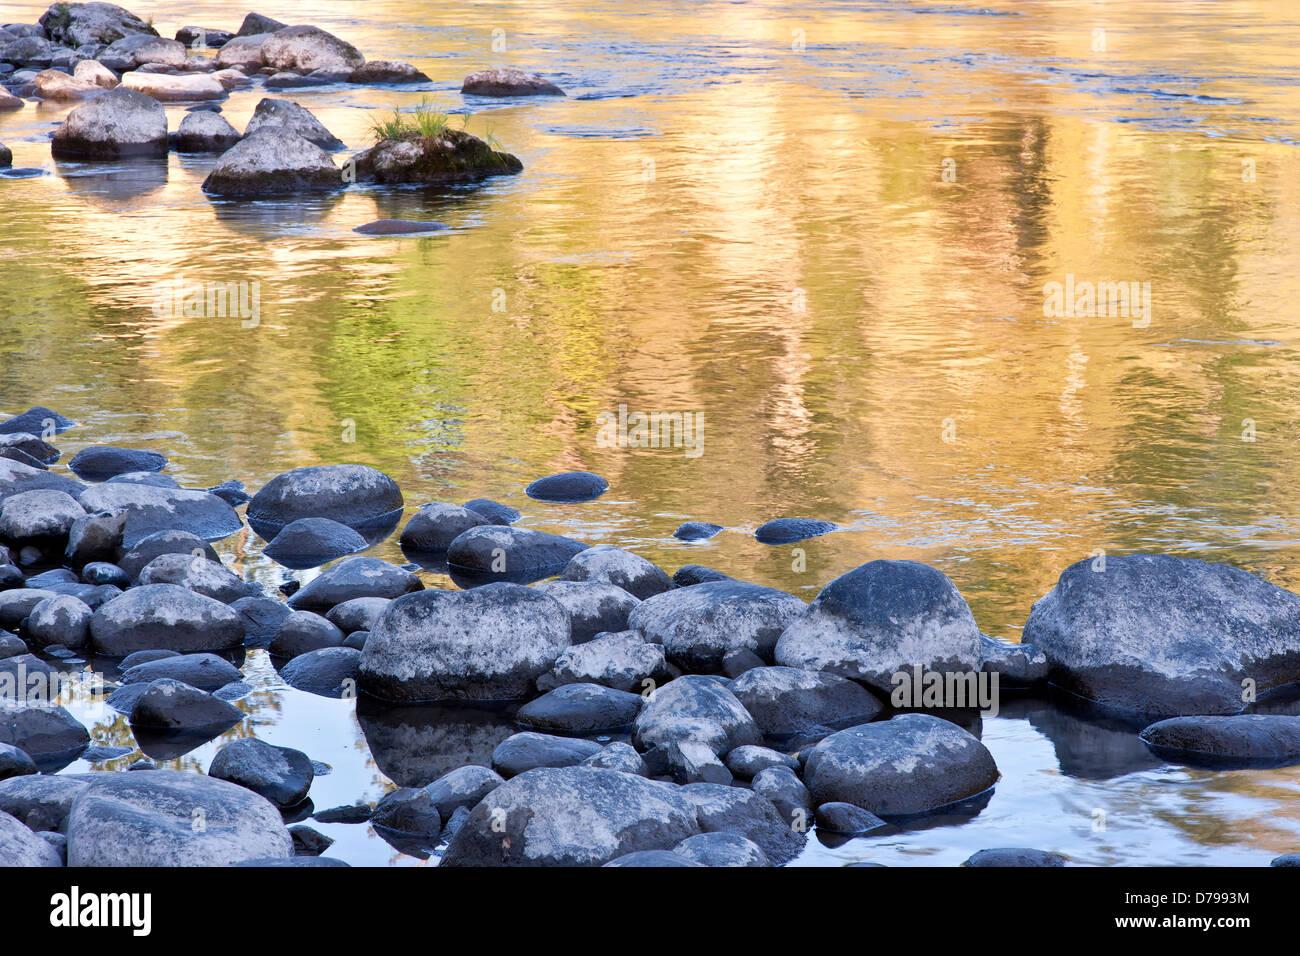 Autumn reflections, Clackamas River. - Stock Image